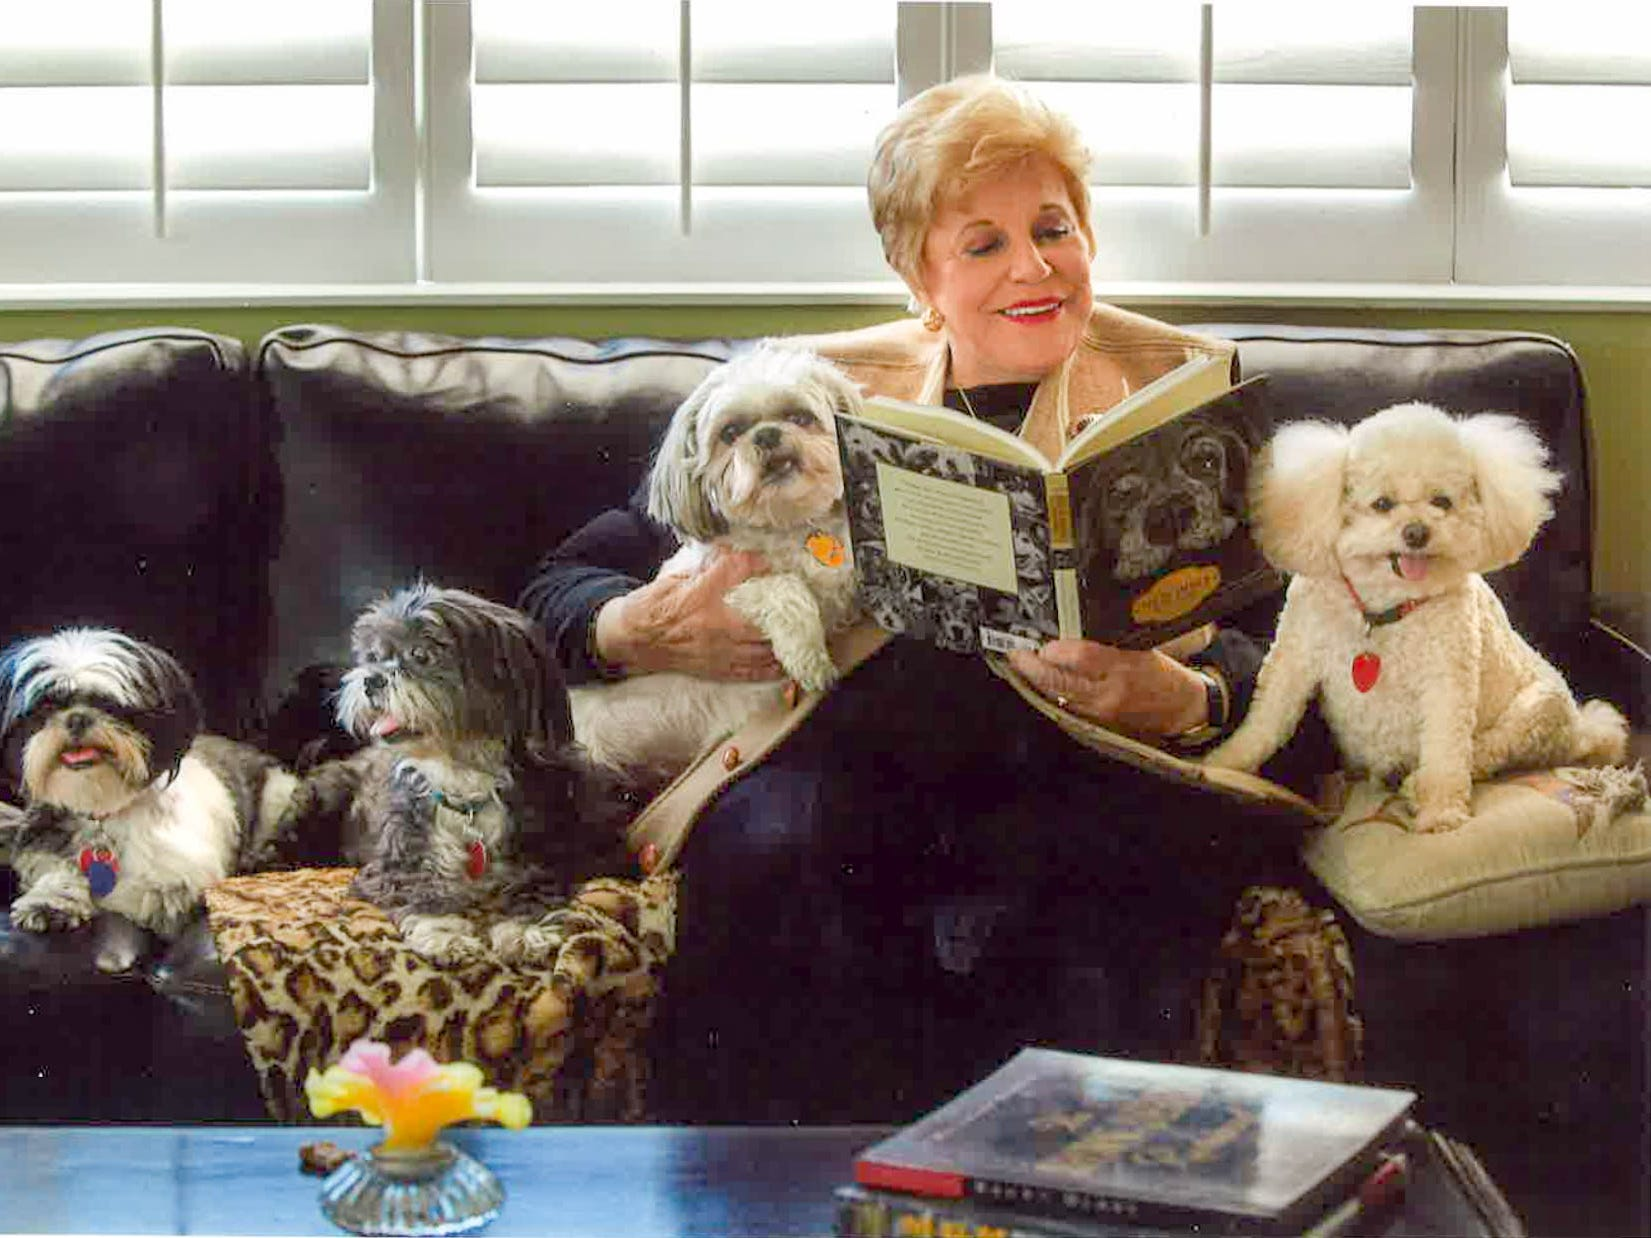 Kaye Ballard often read to her many beloved dogs at her home on Kaye Ballard Lane in Rancho Mirage.